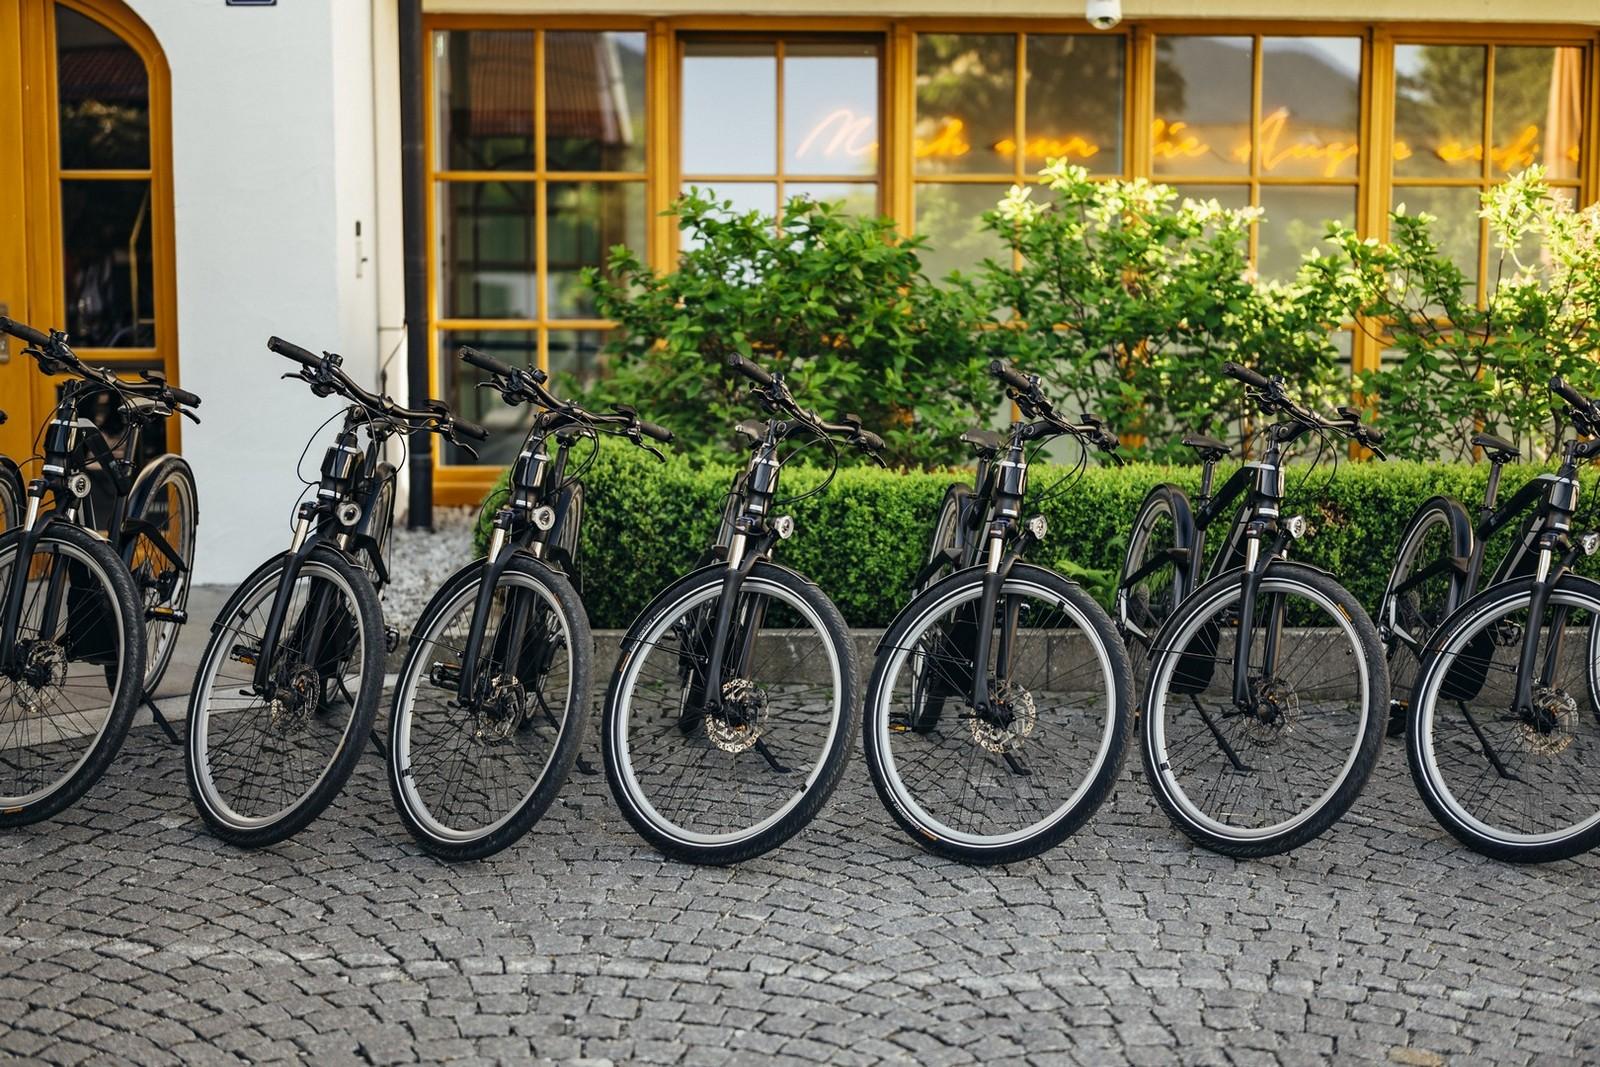 prova su strada bmw active hybrid e bike vaielettrico. Black Bedroom Furniture Sets. Home Design Ideas